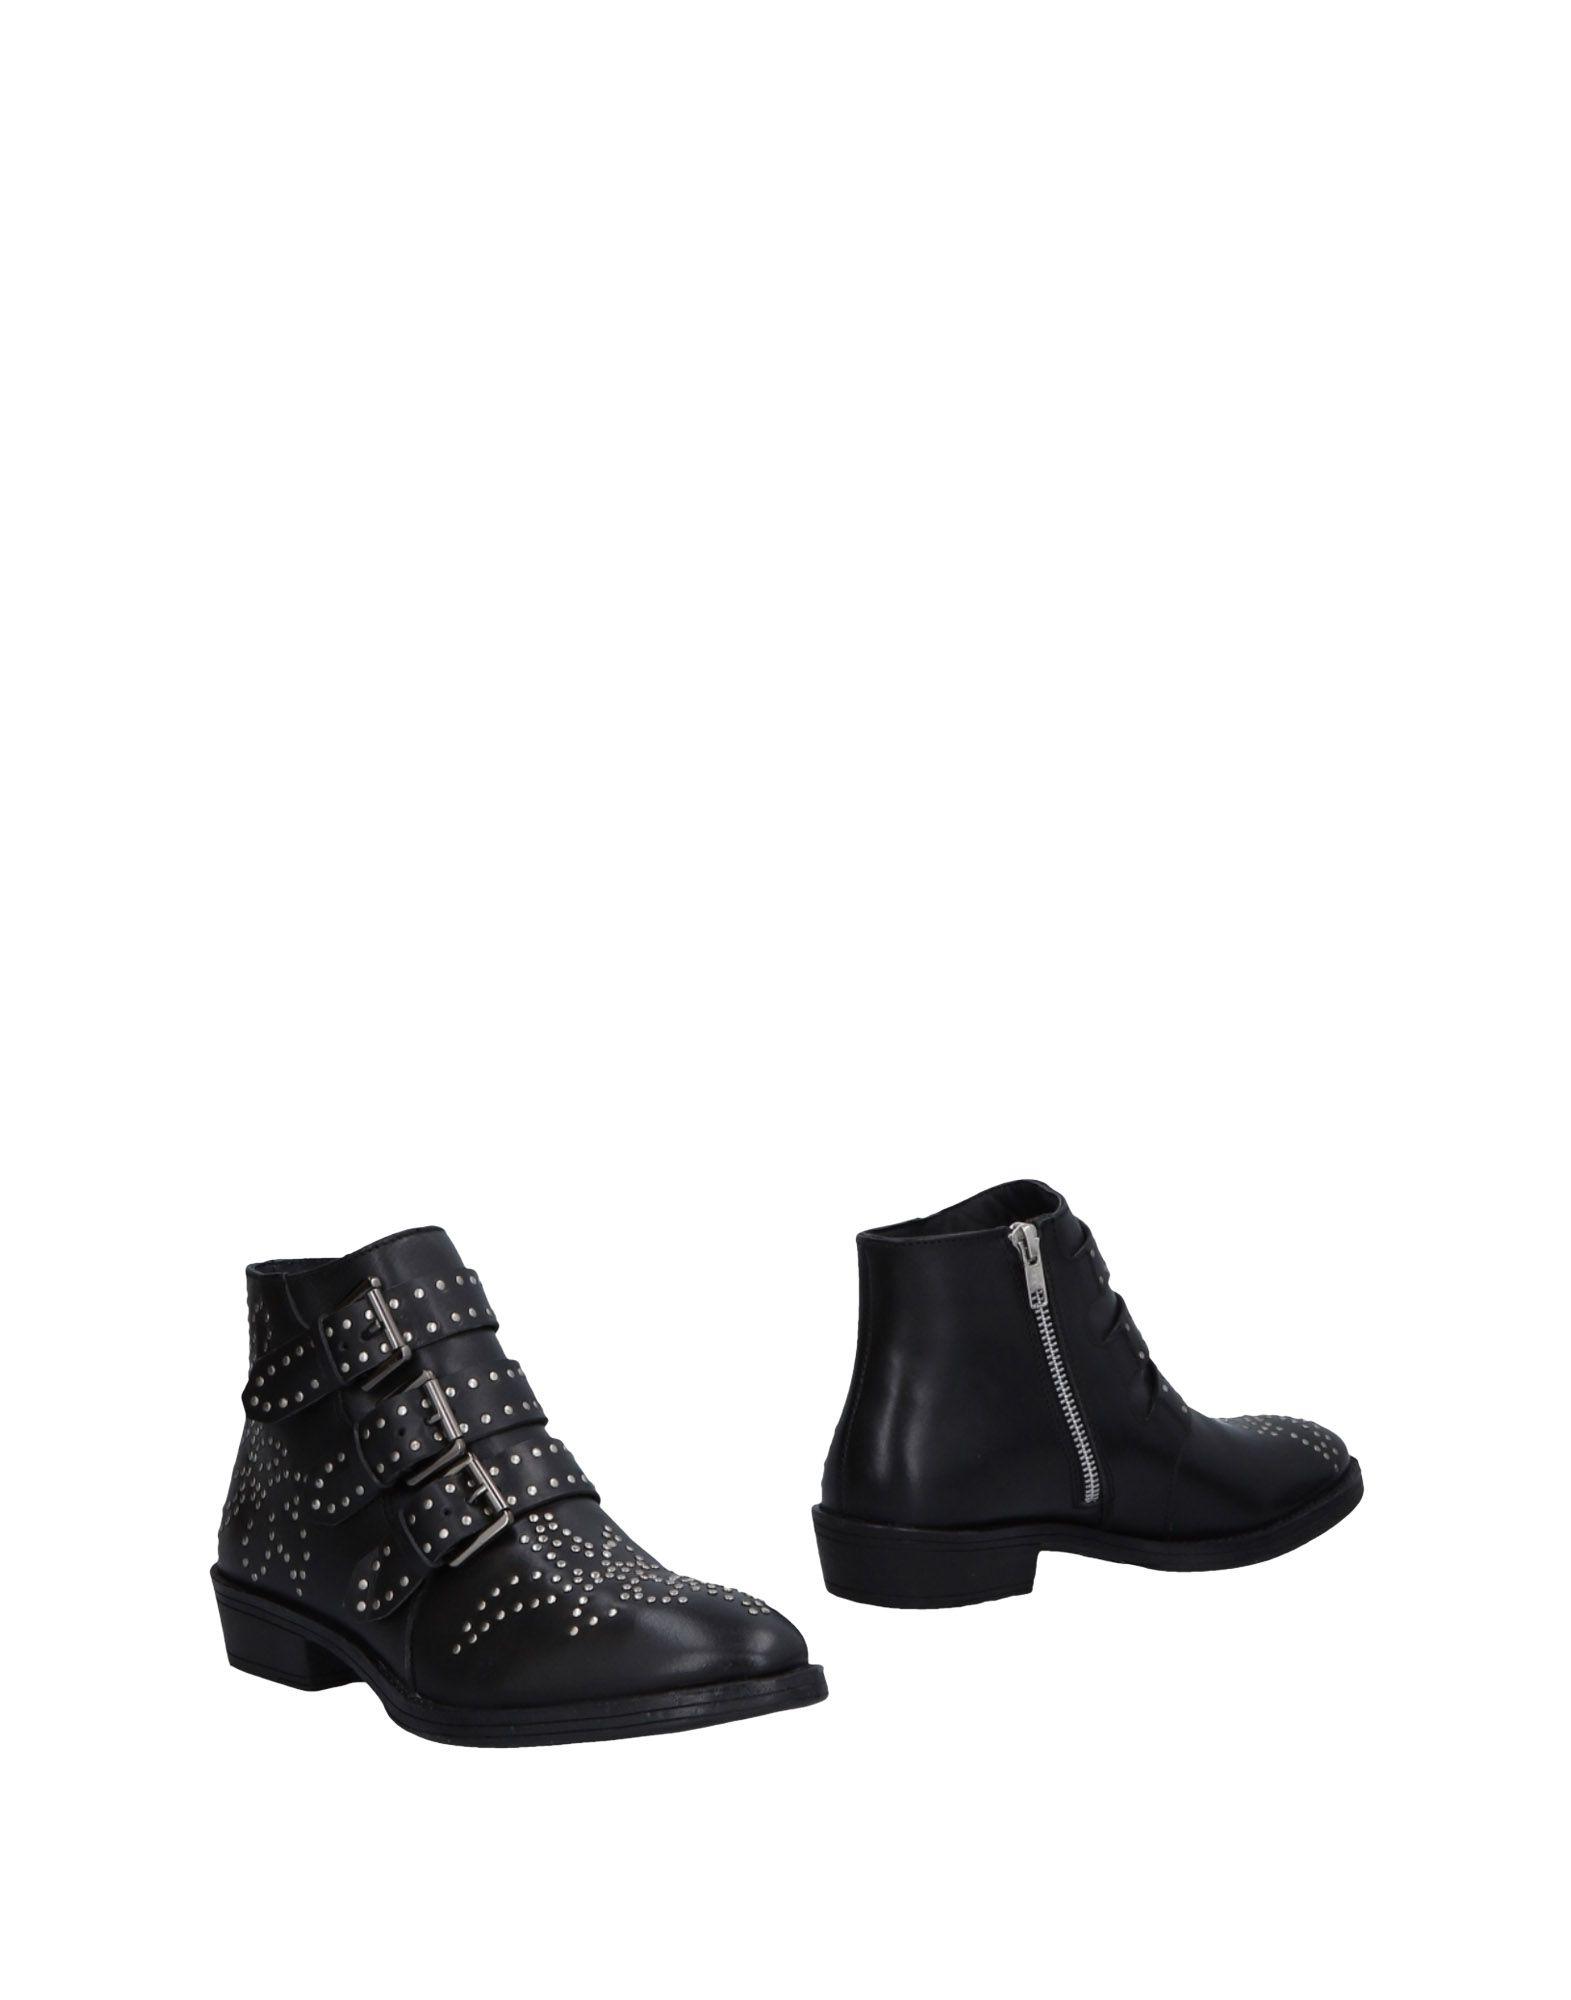 Nila & Nila Stiefelette Damen  11476778QR Gute Qualität beliebte Schuhe